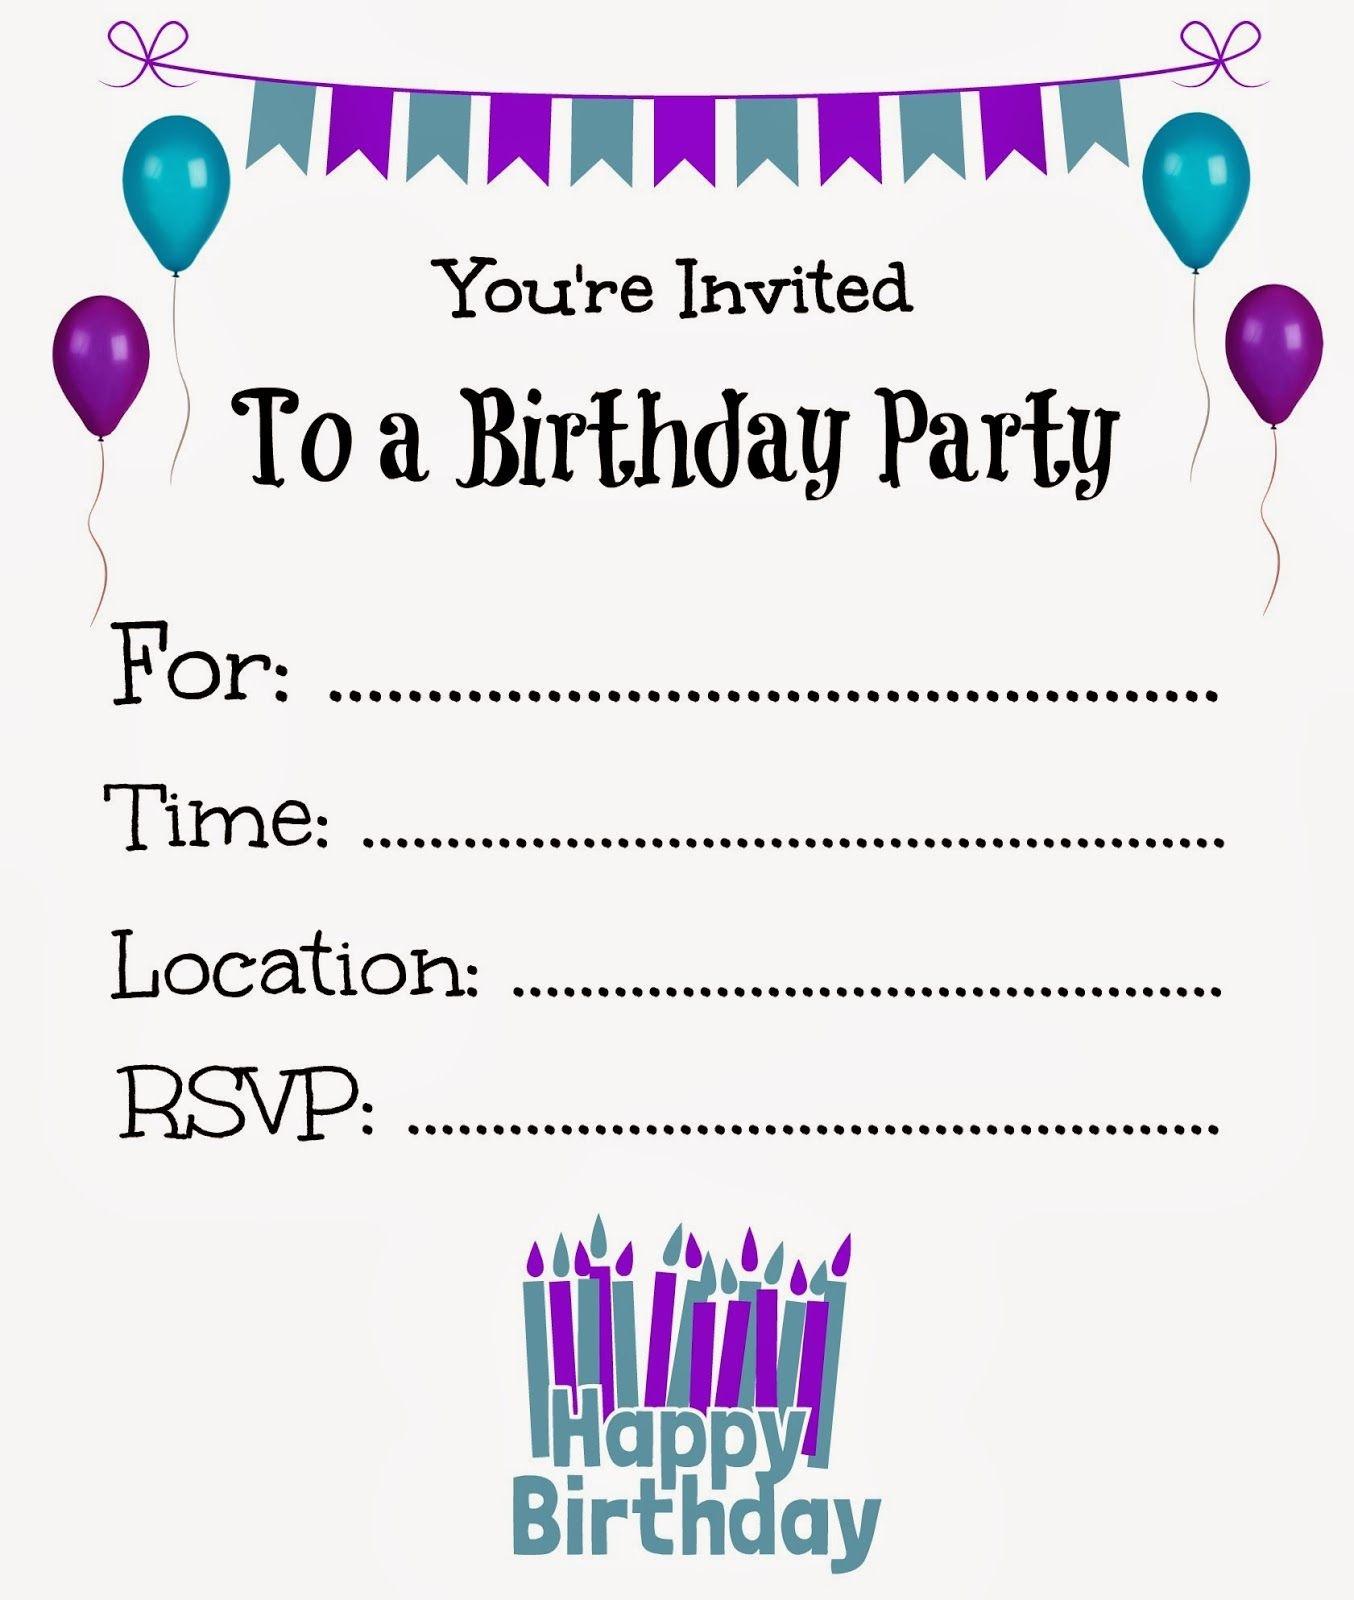 Free Printable Birthday Invitations For Kids #freeprintables - Birthday Party Invitations Online Free Printable